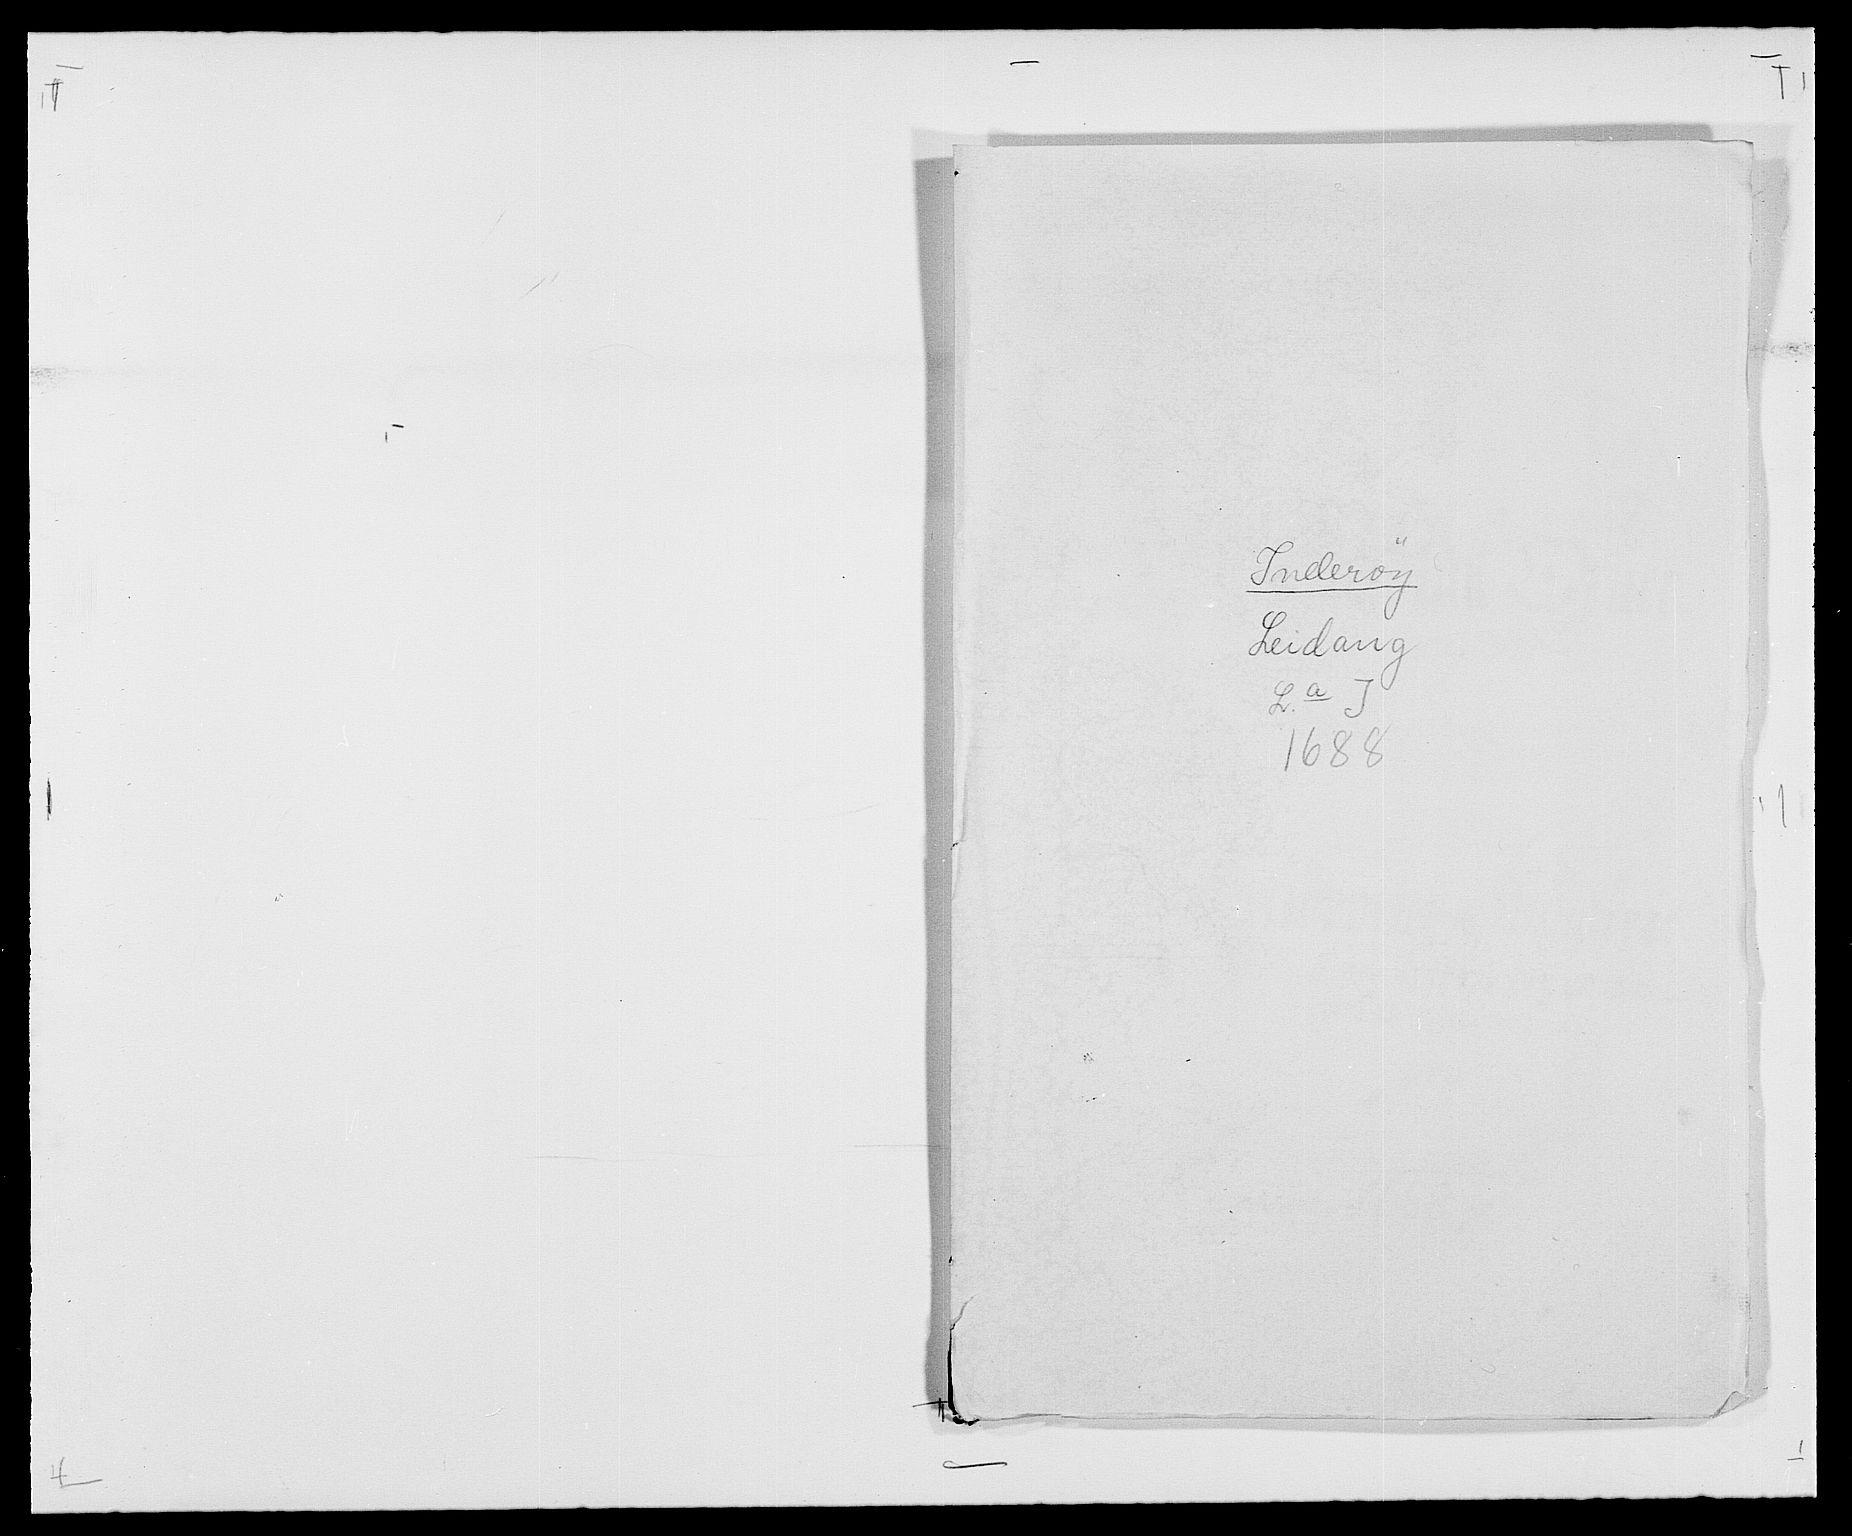 RA, Rentekammeret inntil 1814, Reviderte regnskaper, Fogderegnskap, R63/L4306: Fogderegnskap Inderøy, 1687-1689, s. 303